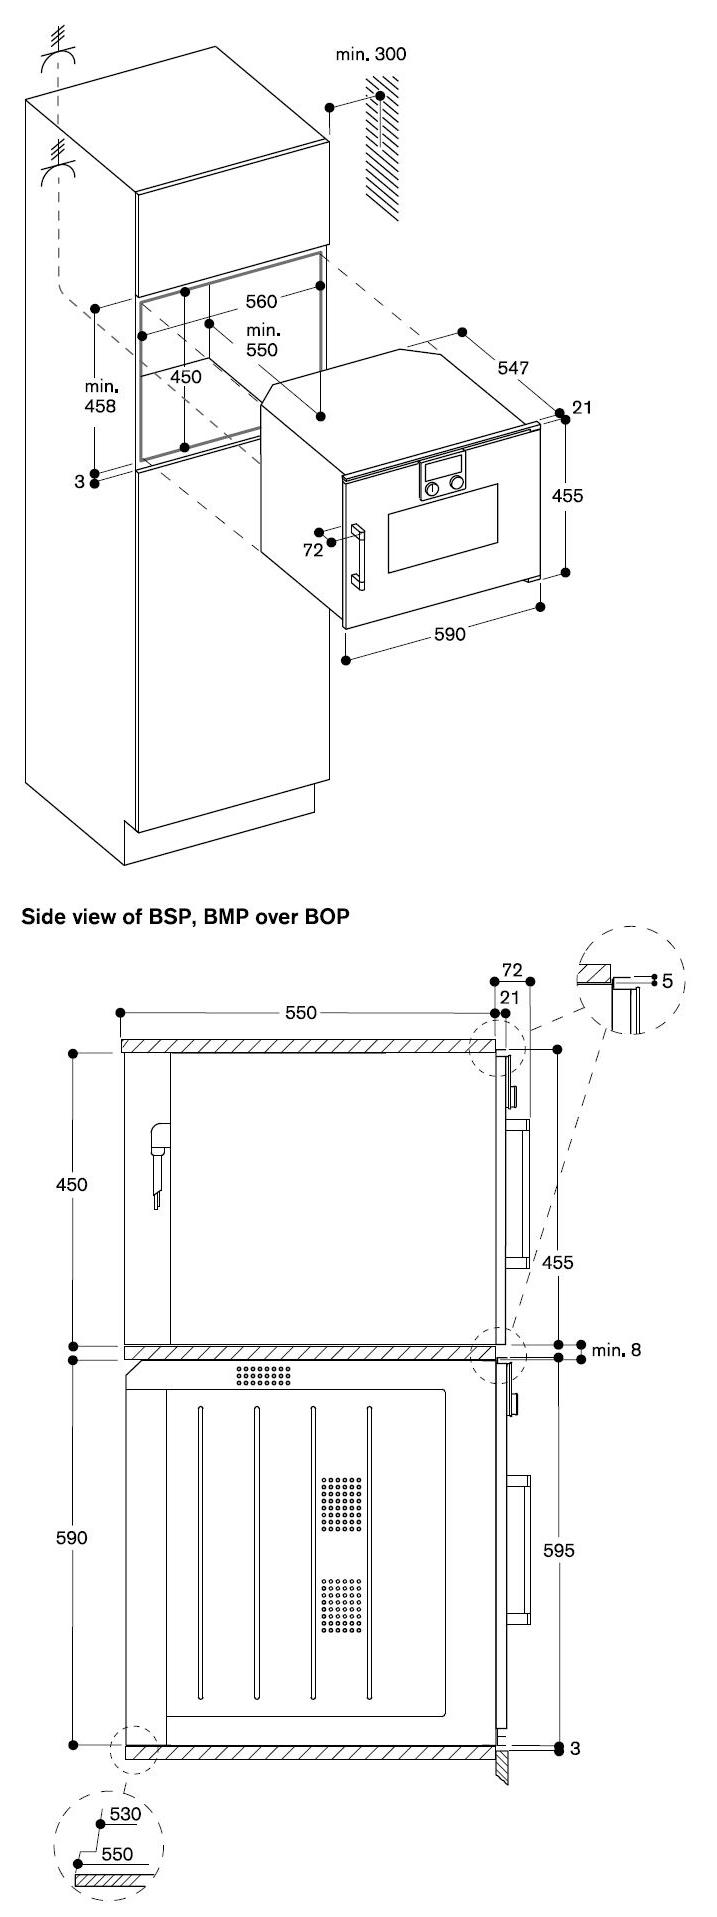 SEBP28070104 in addition 6008 Simplicity Broadmoor Wiring Diagram likewise L0010519 moreover SEBP45720449 likewise Fyou Pmec Gauges Catalog2017api Thread Gauges api Thread Measuring Gauge block Gauges. on 60 amp plug